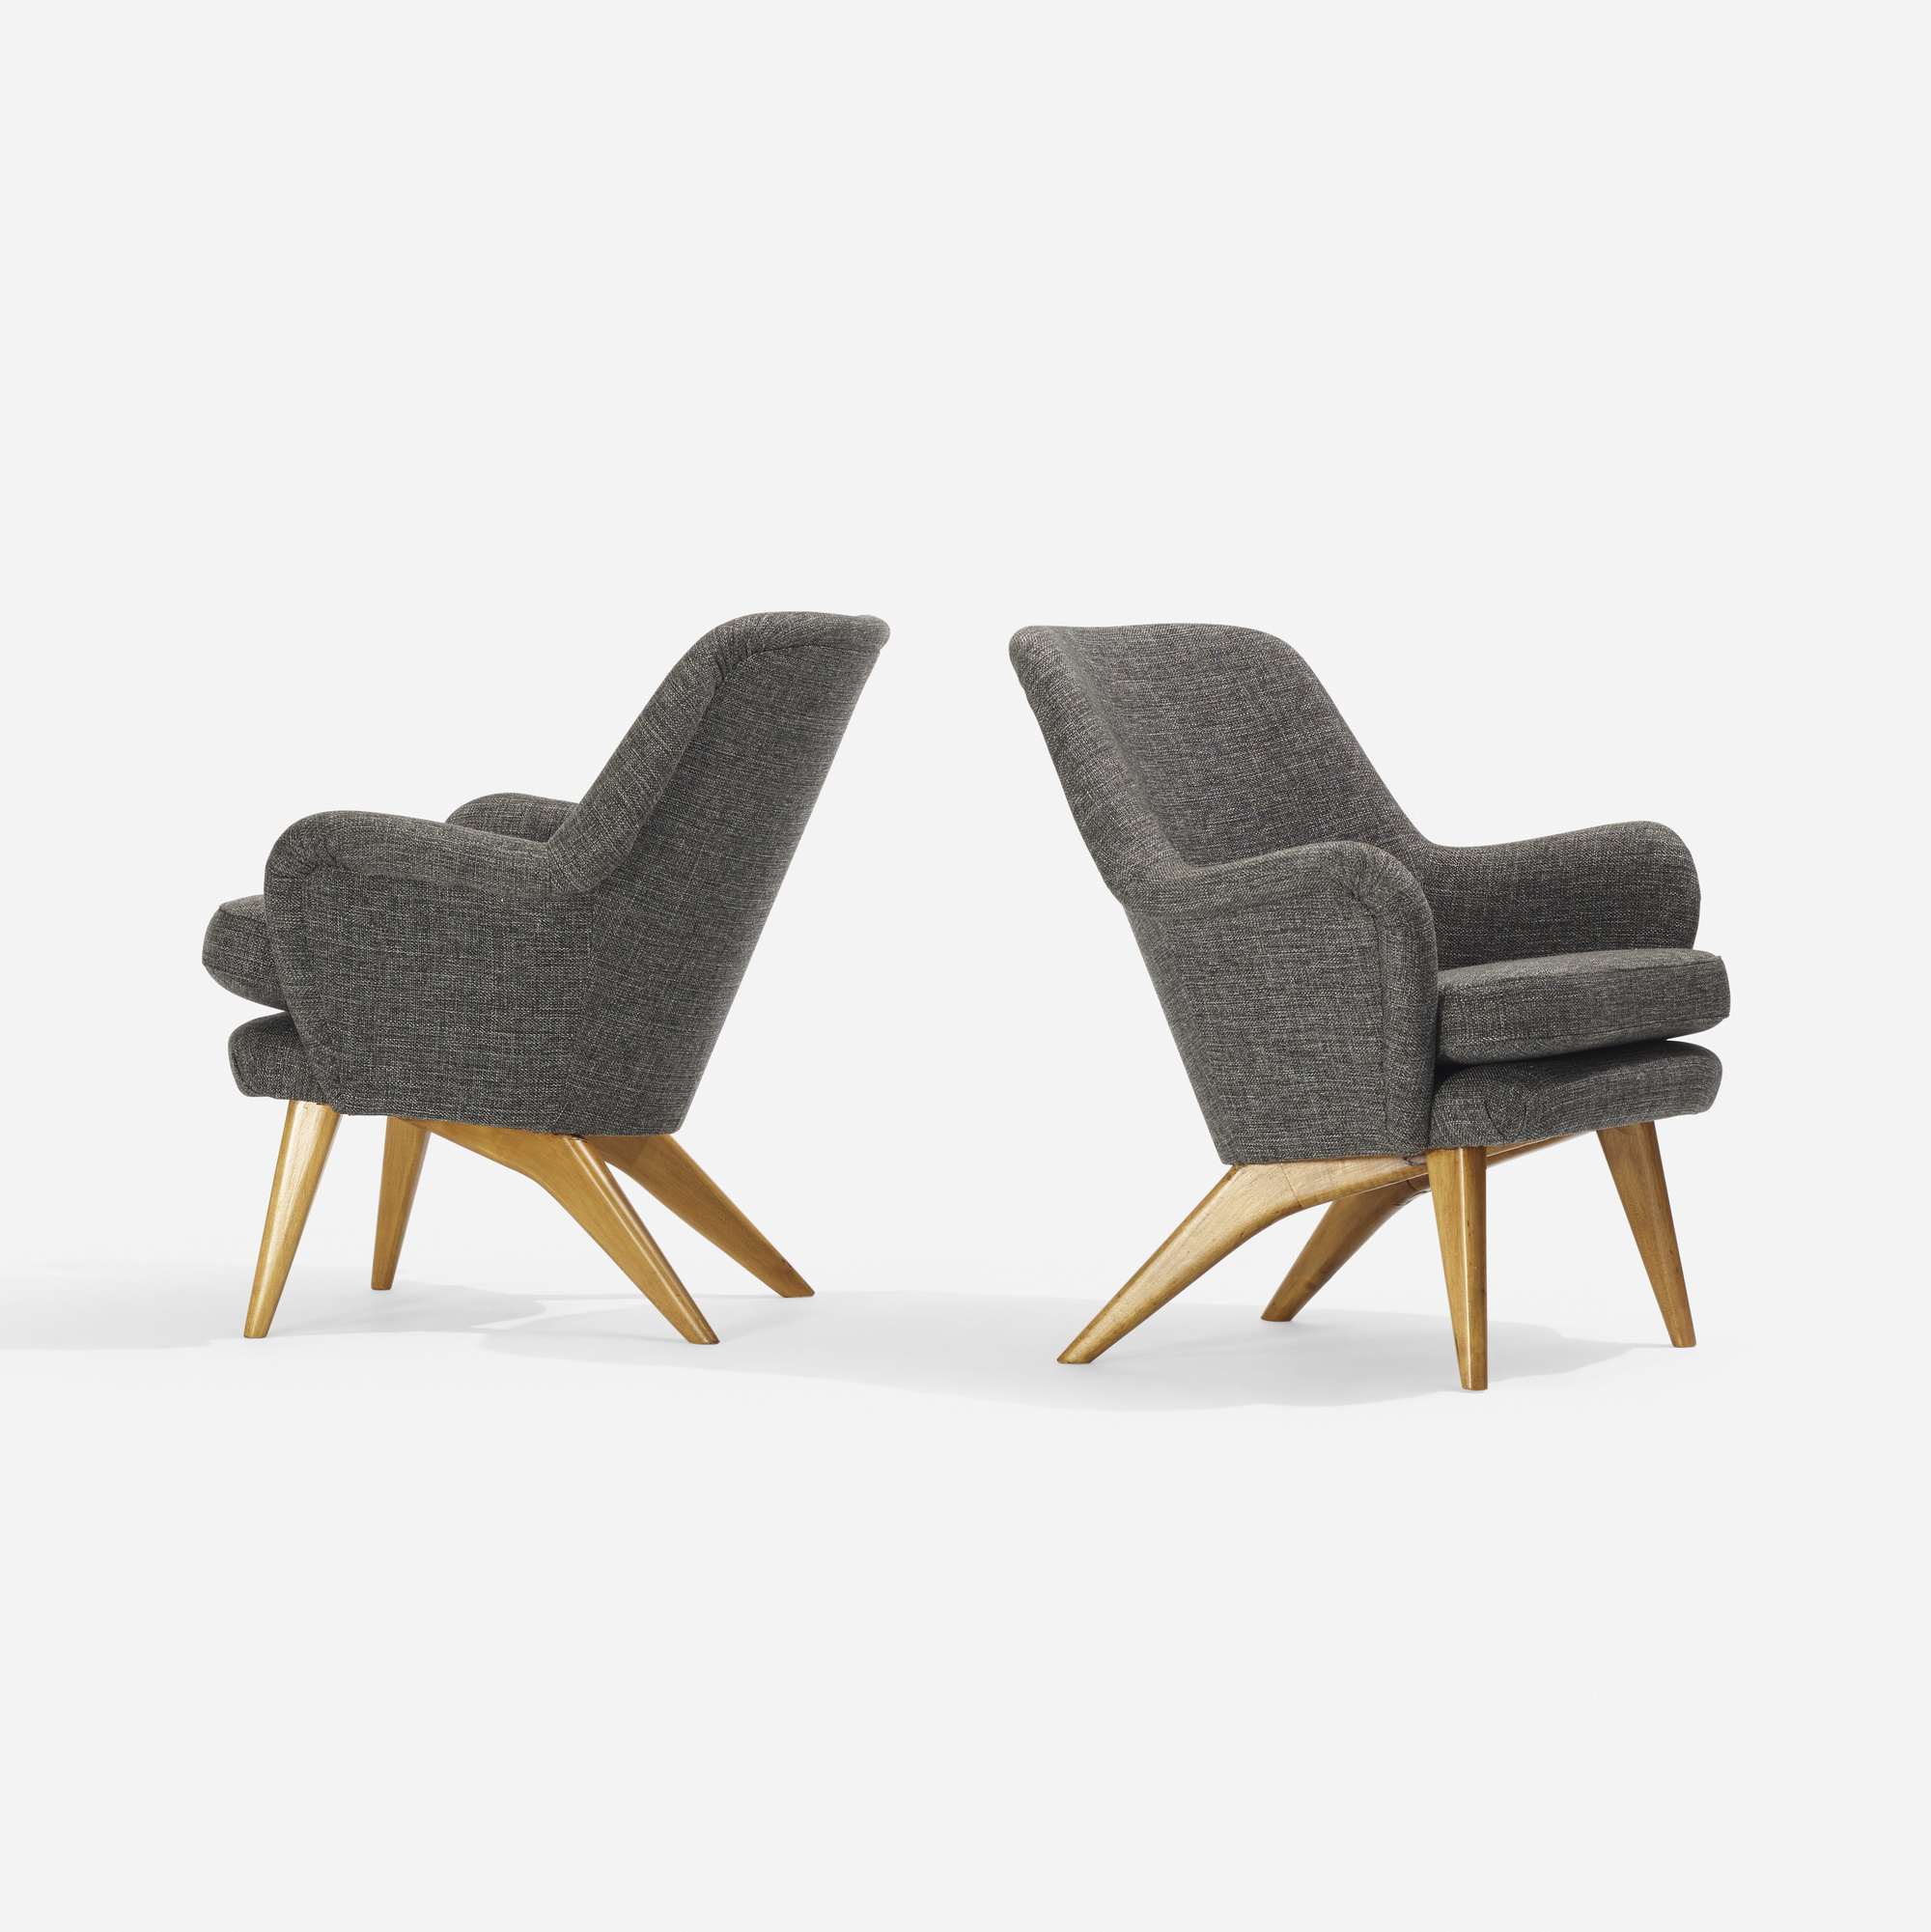 322: Carl-Gustav Hiort af Ornäs / armchairs, pair (1 of 2)